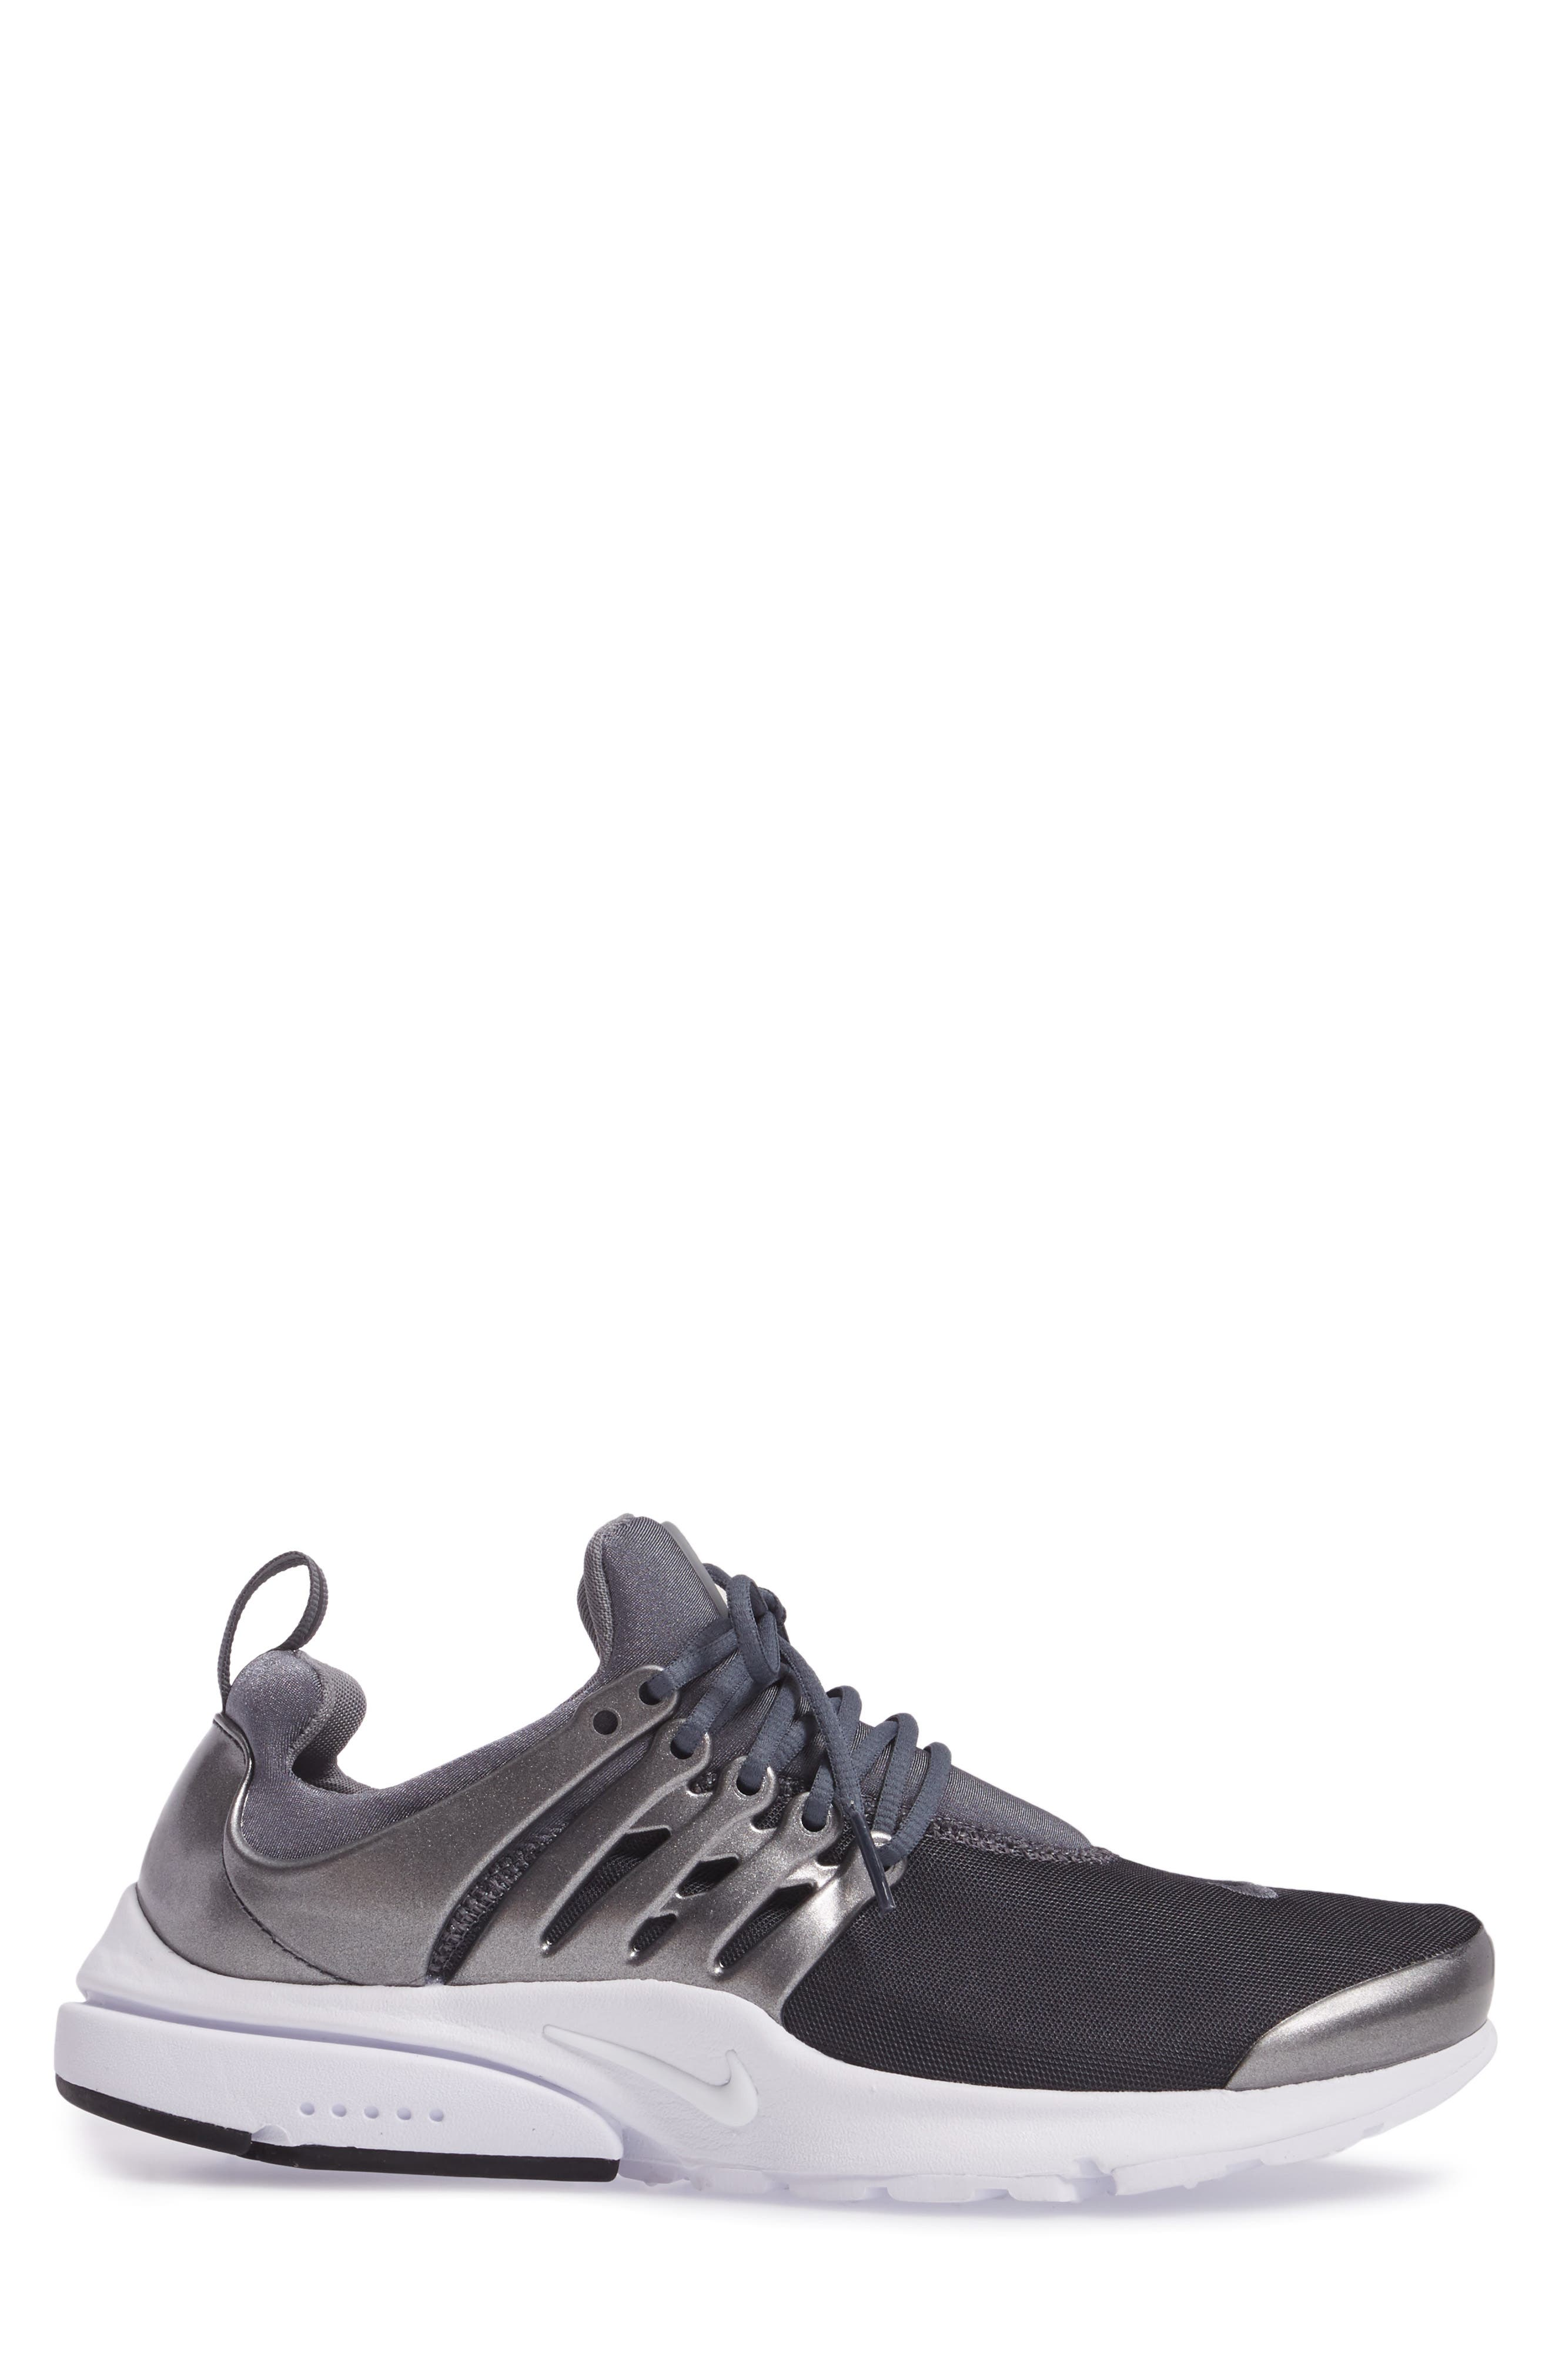 Air Presto Premium Sneaker,                             Alternate thumbnail 3, color,                             Metallic Hematite/ Cool Grey